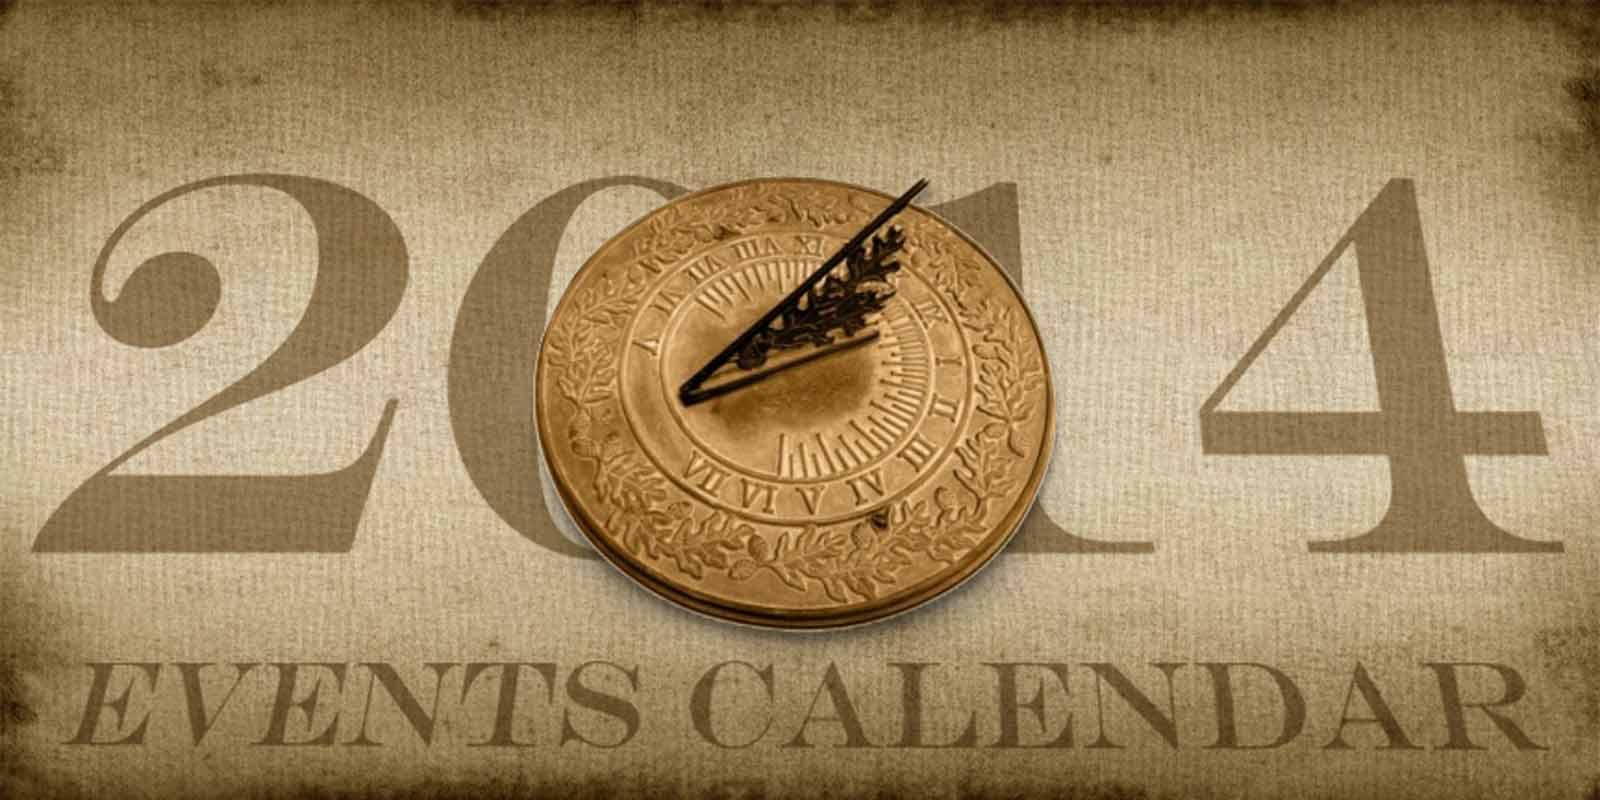 Events Calendar for 2014!